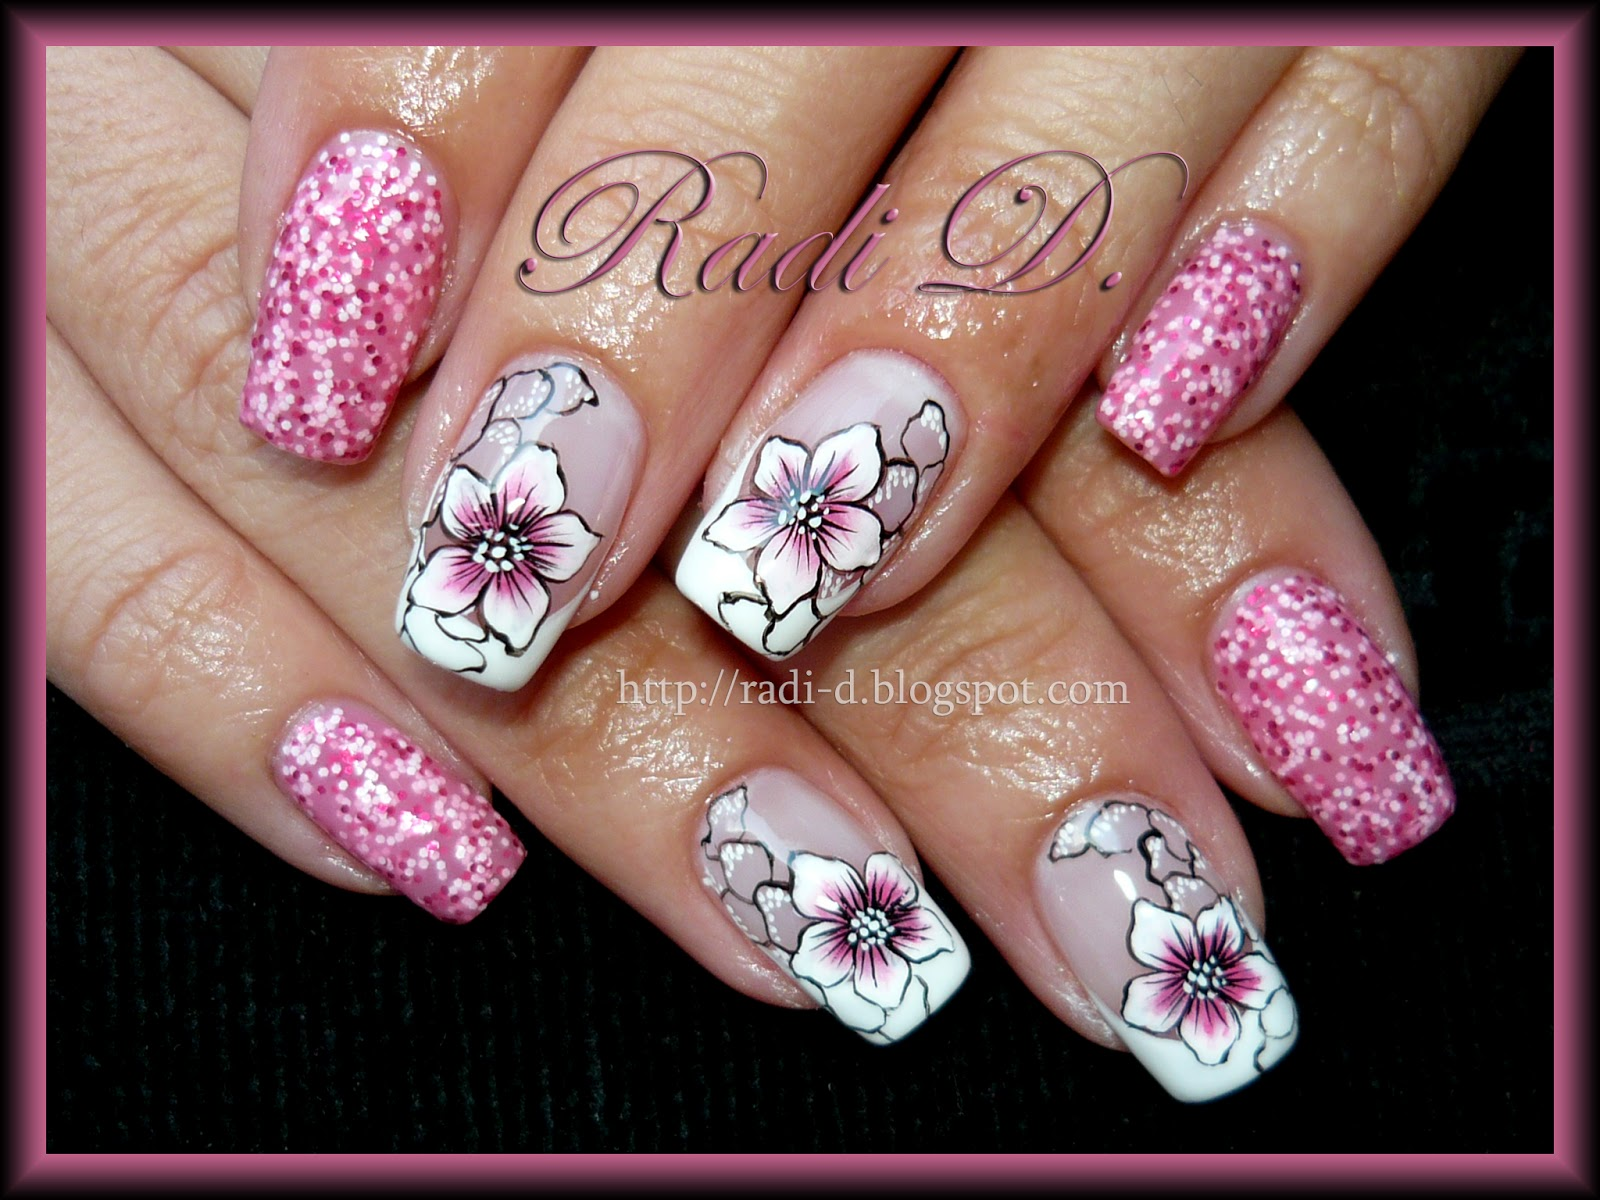 Golden Rose Jolly Jewels 109